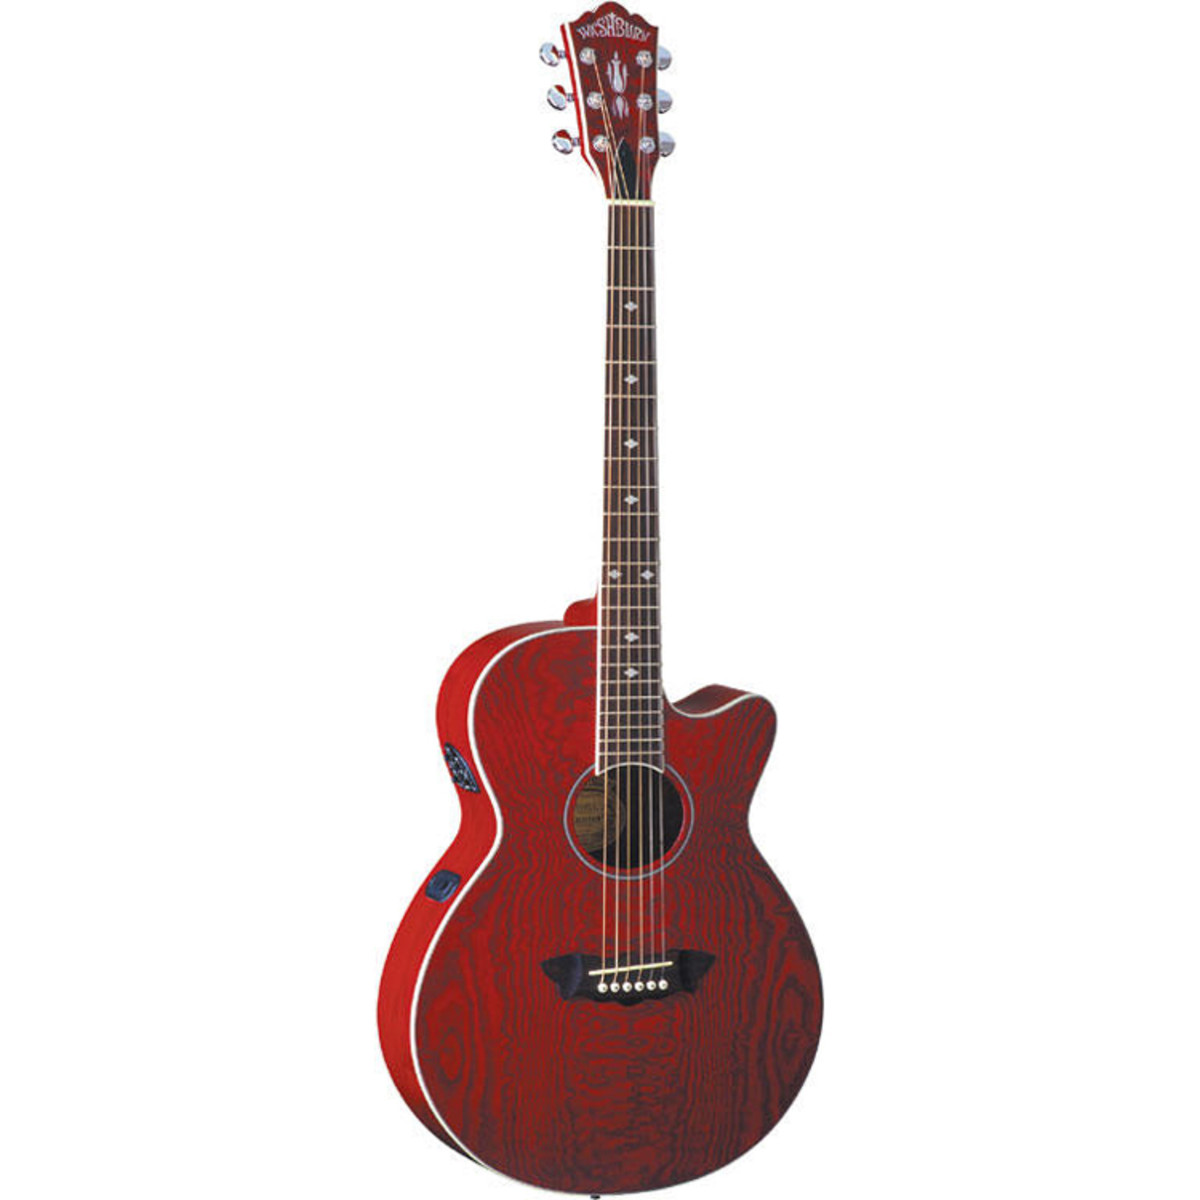 About Washburn Guitars